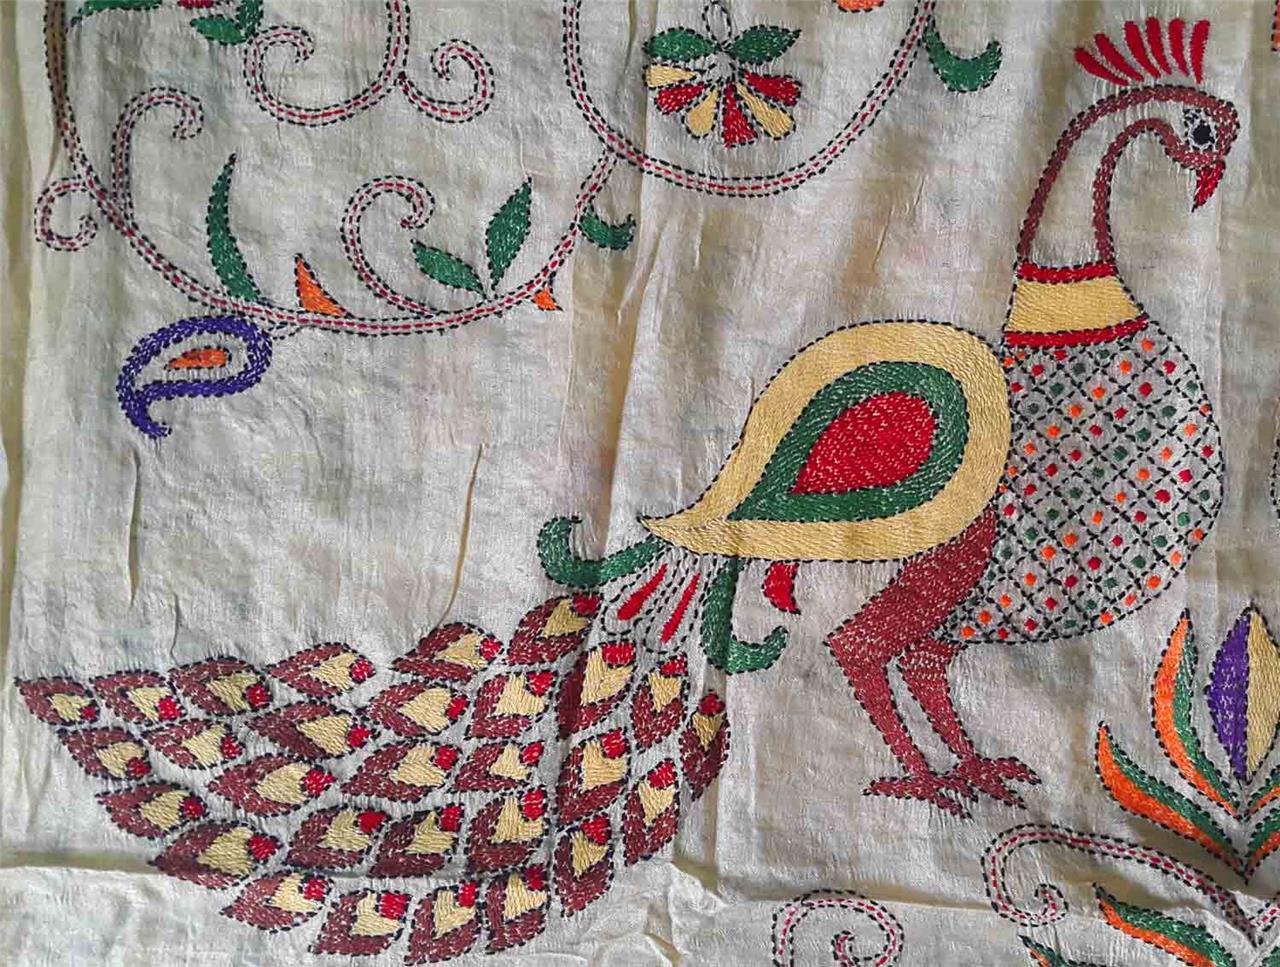 India ethnic designer sari kantha stitch hand embroidery